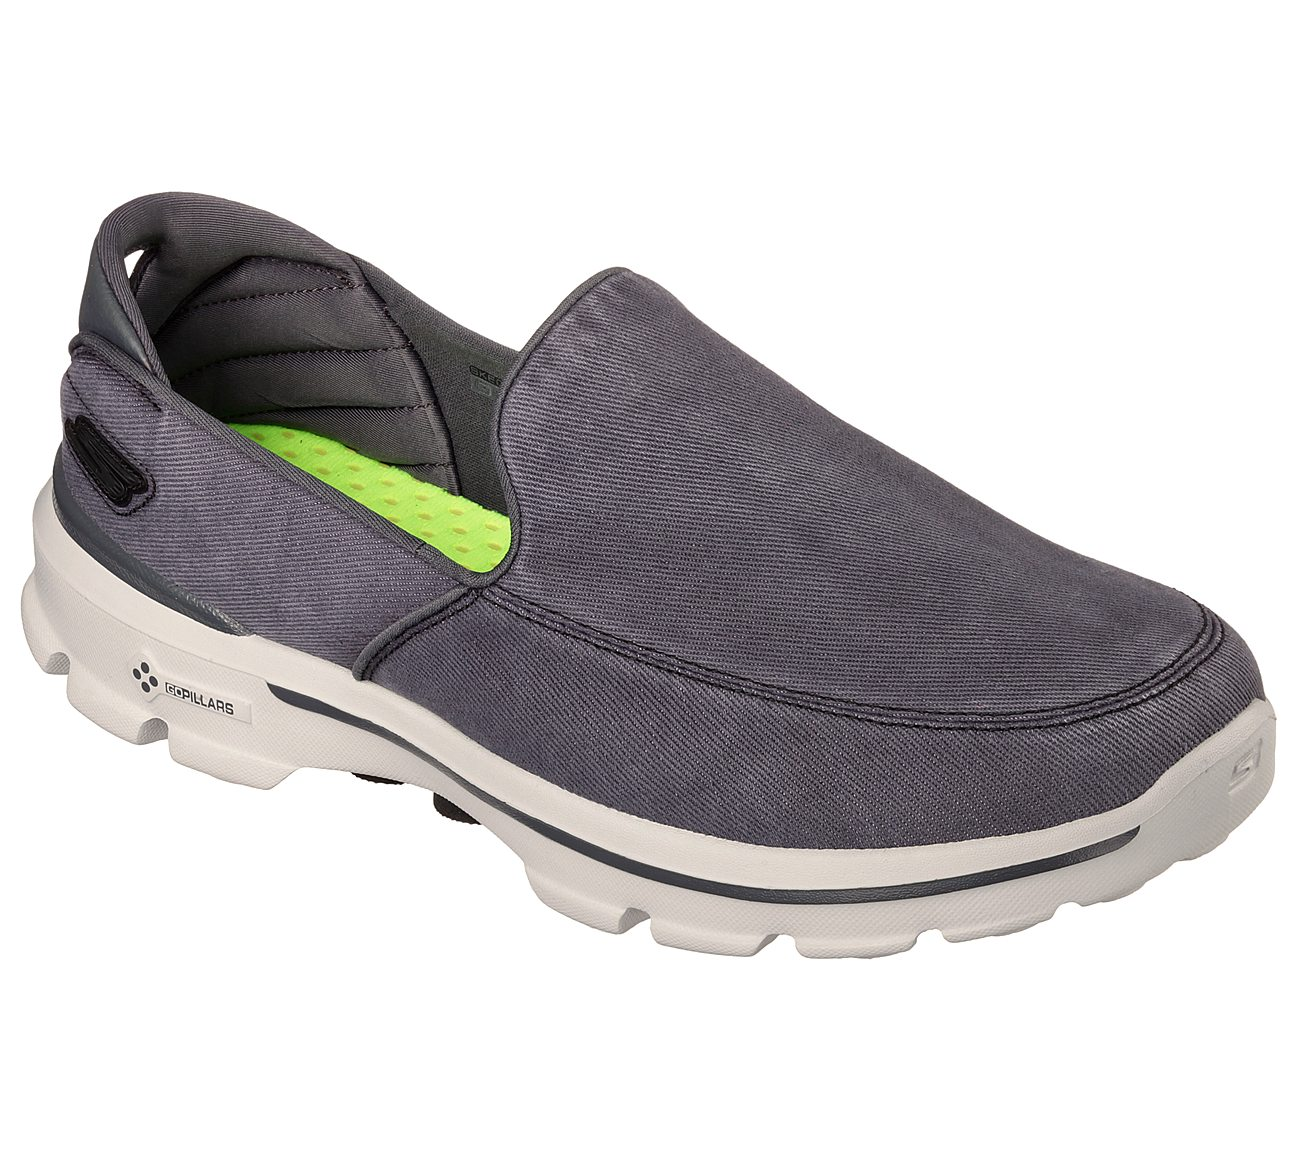 1e1d772ee1ca Buy SKECHERS Skechers GOwalk 3 - Unwind Skechers Performance Shoes ...